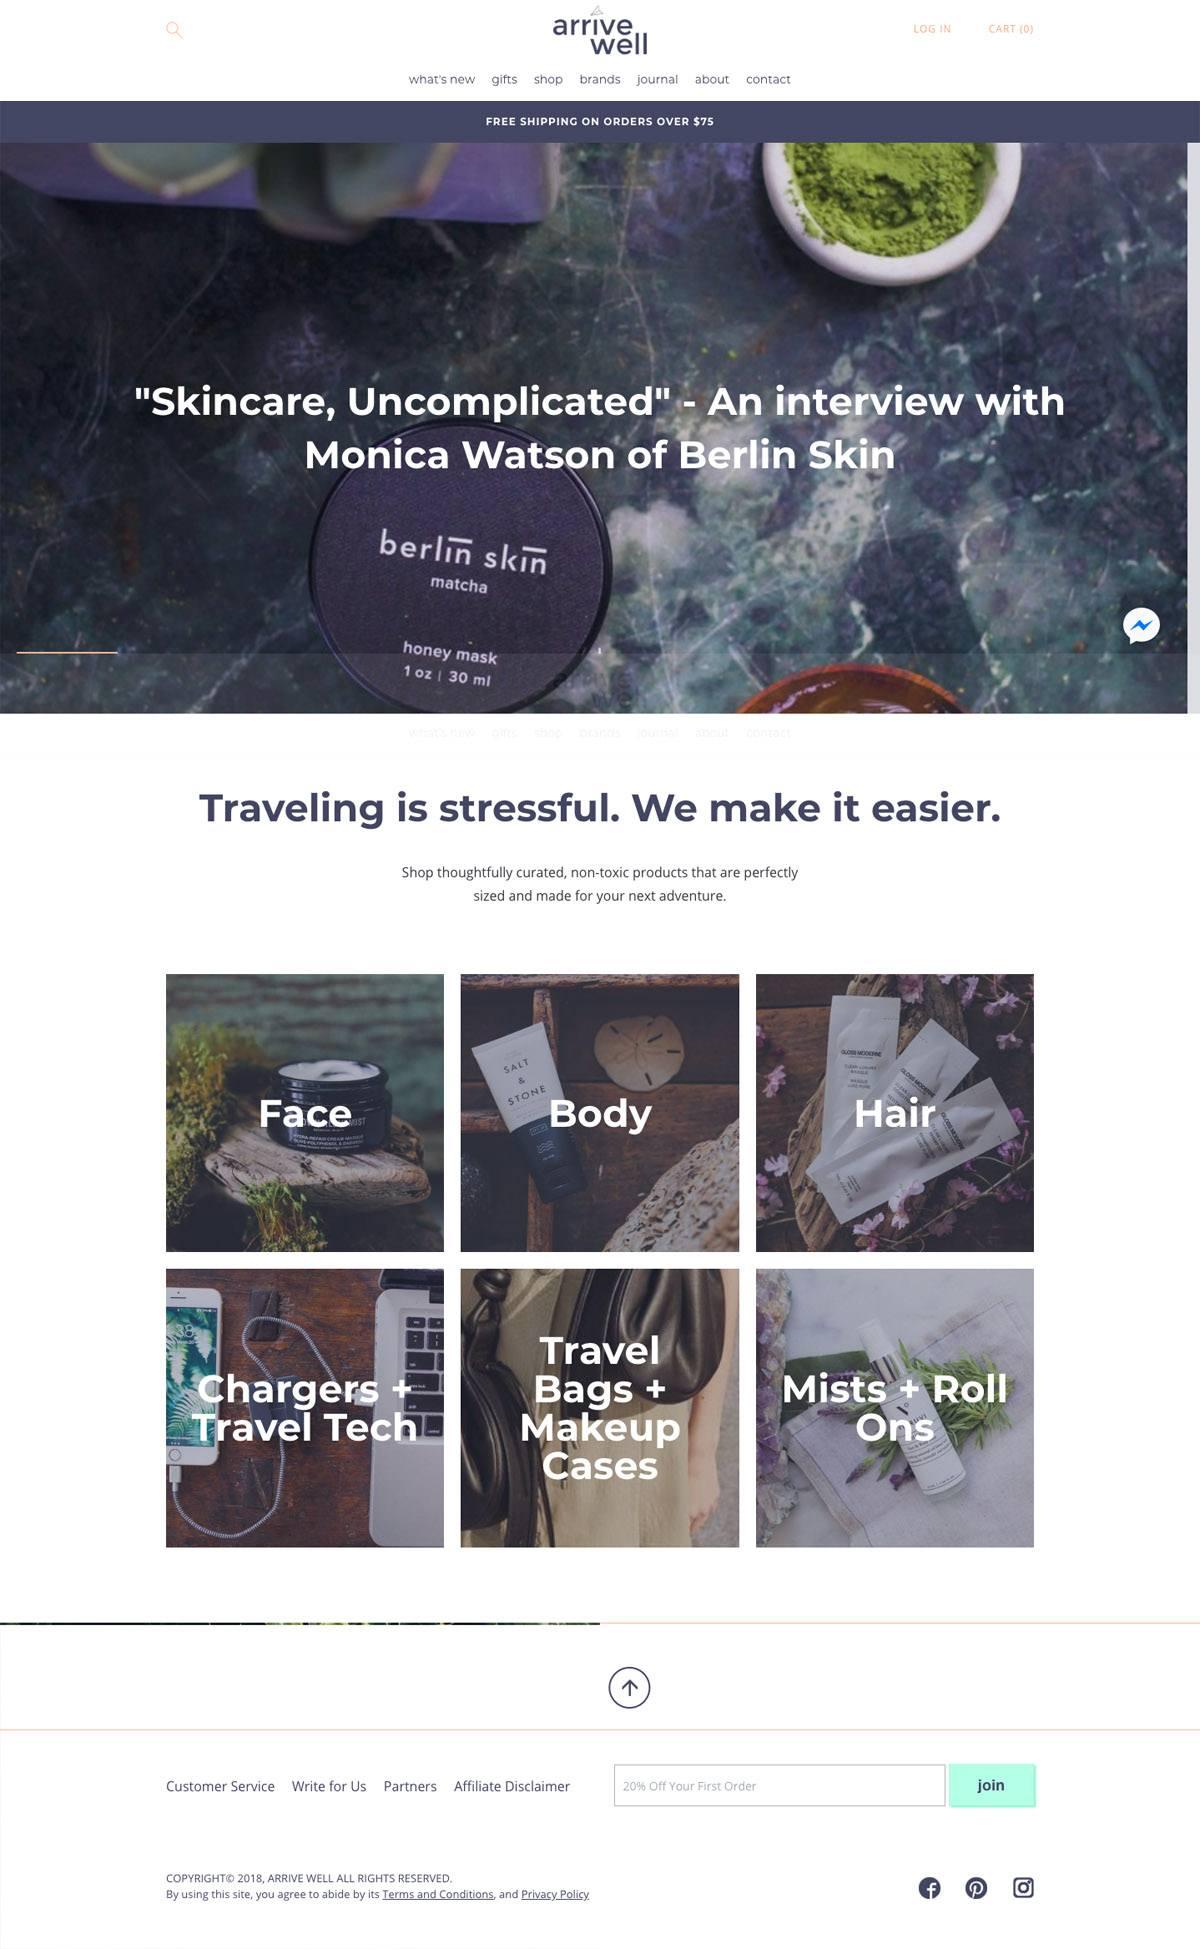 eCommerce website: Arrive Well